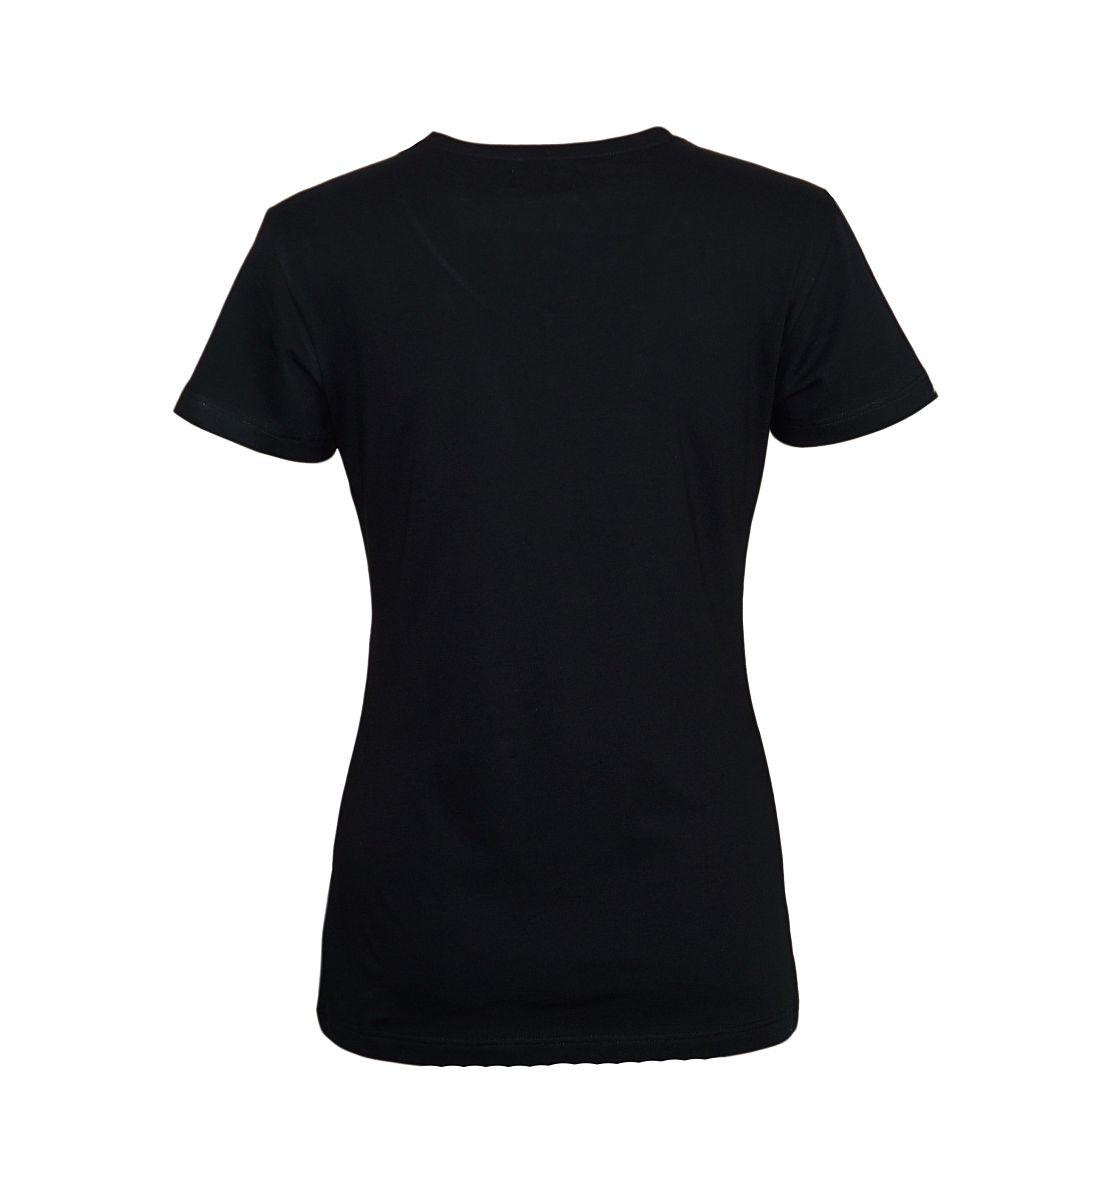 Emporio Armani Damen Shirt T-Shirt V-Ausschnitt 163321 7A317 00020 NERO HW17-EADS1